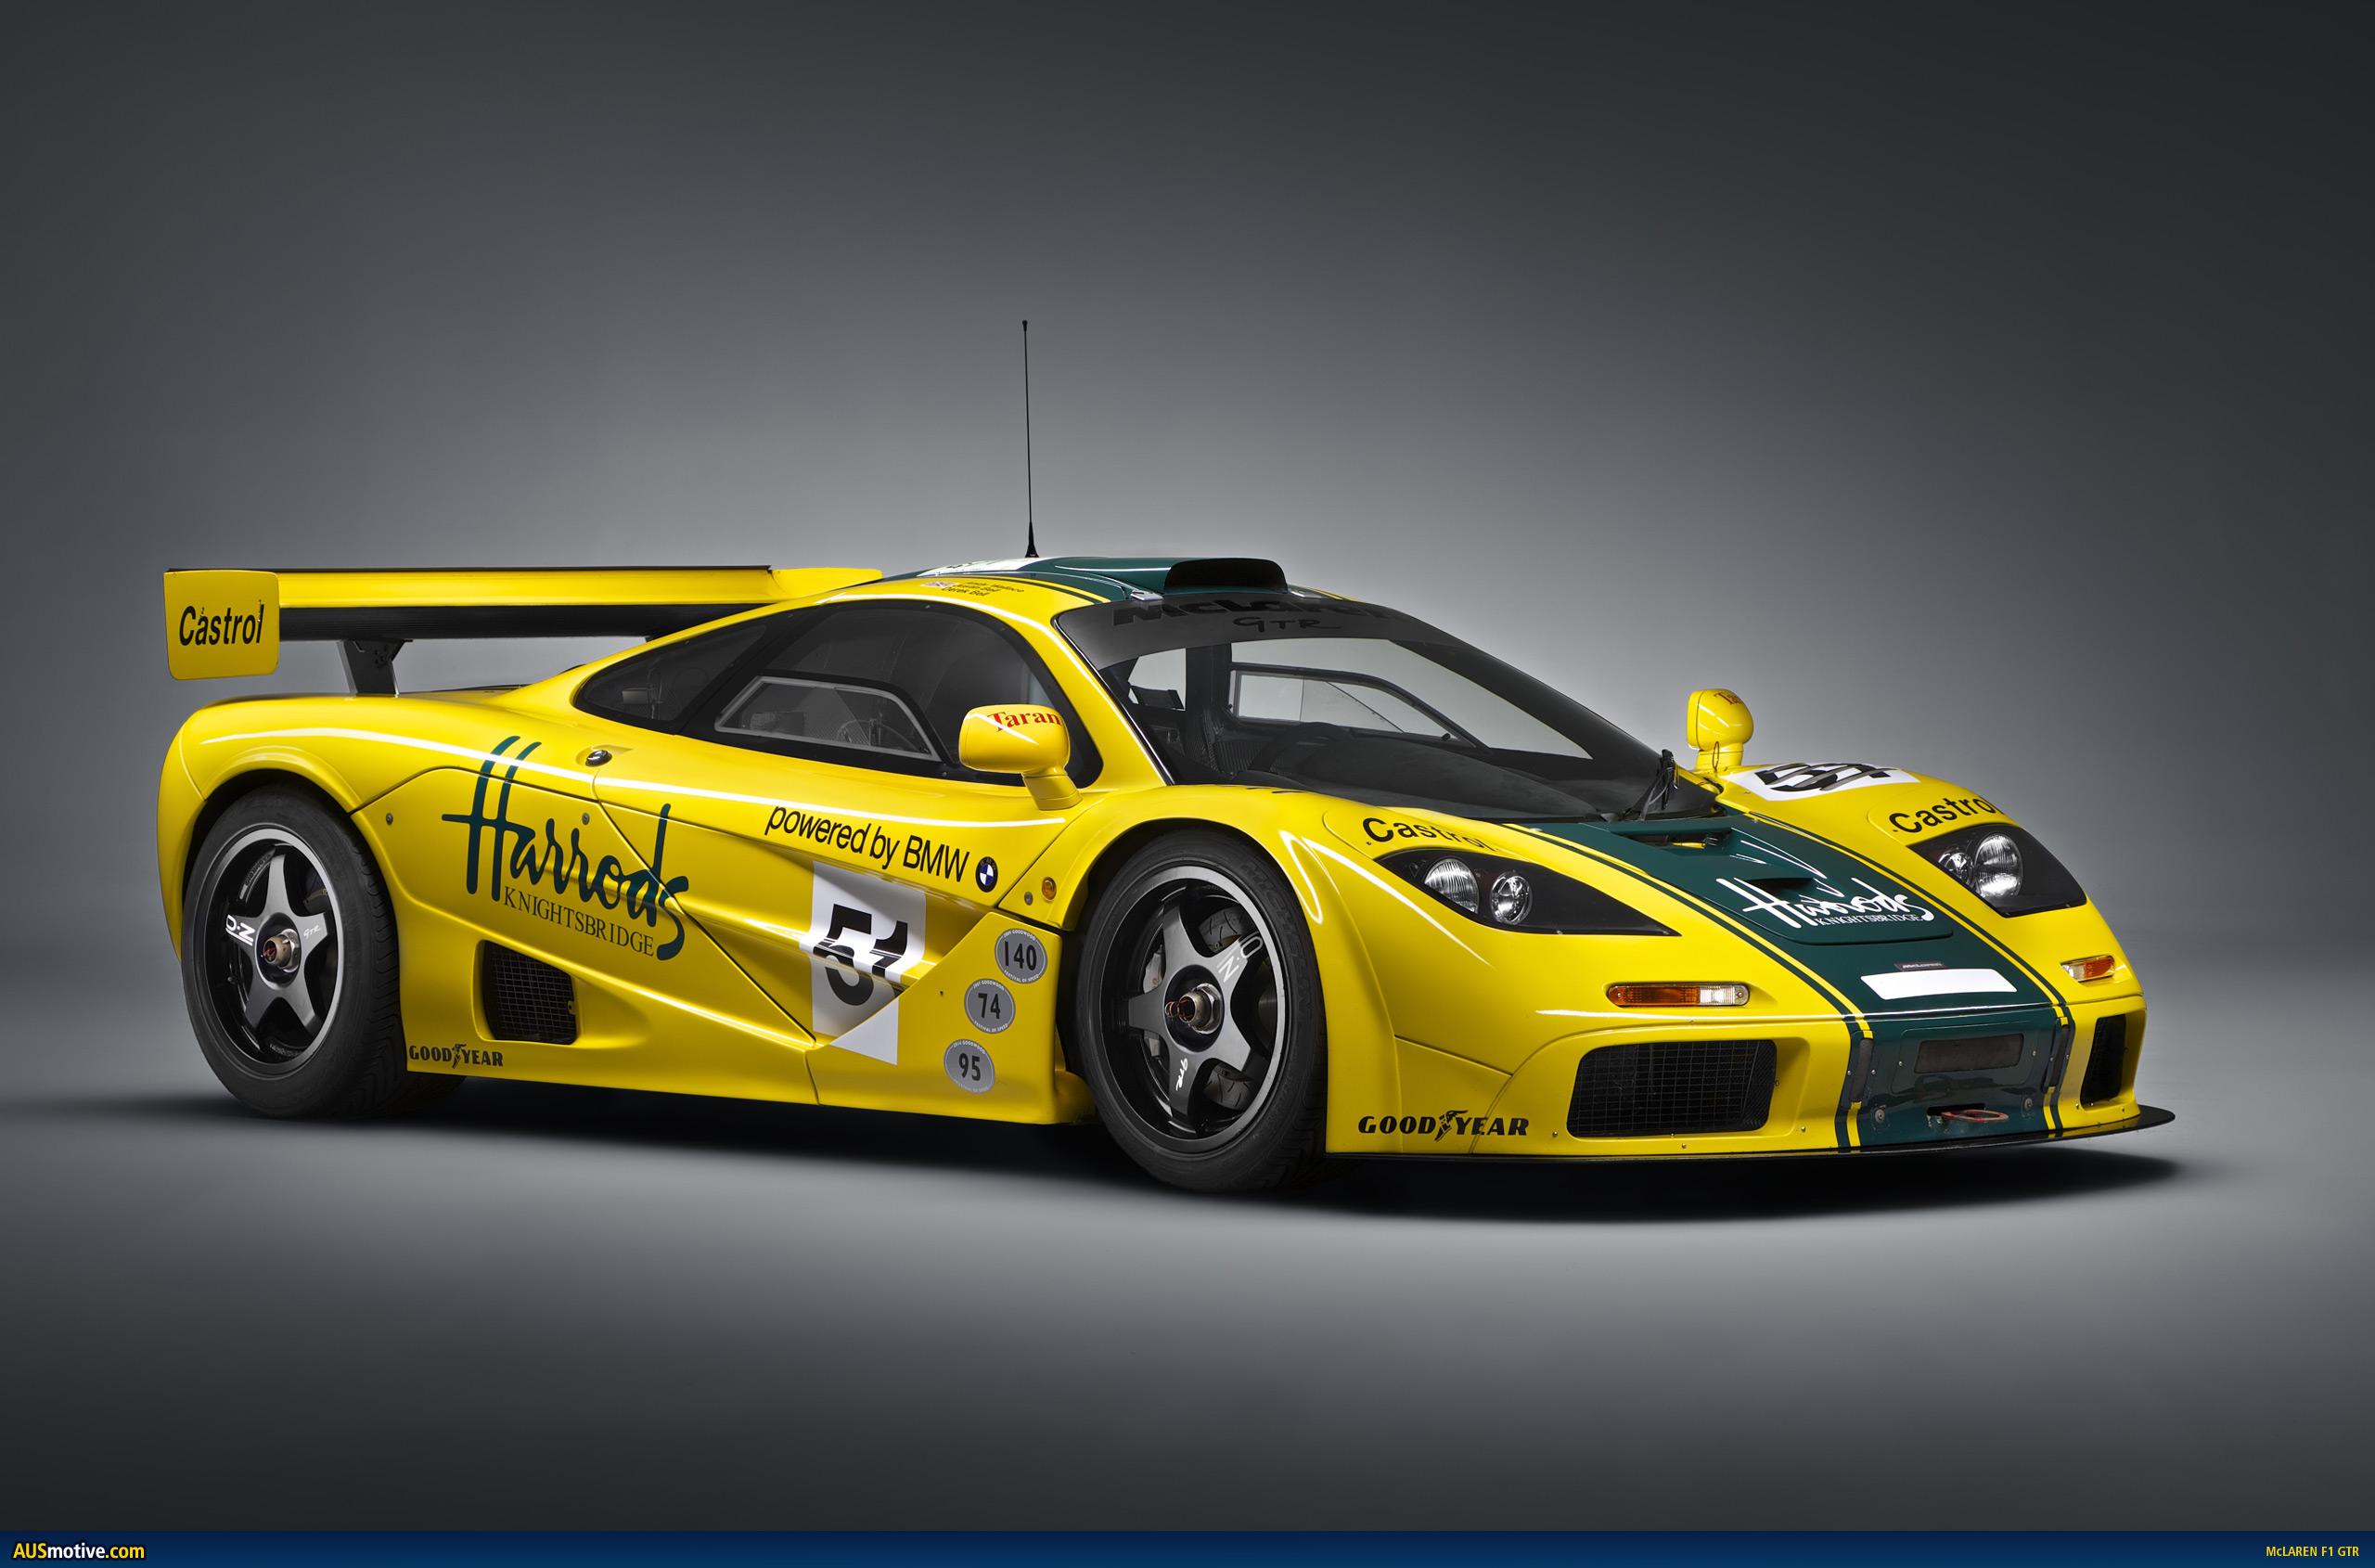 http://www.ausmotive.com/pics/2015/McLaren-F1-GTR-01.jpg